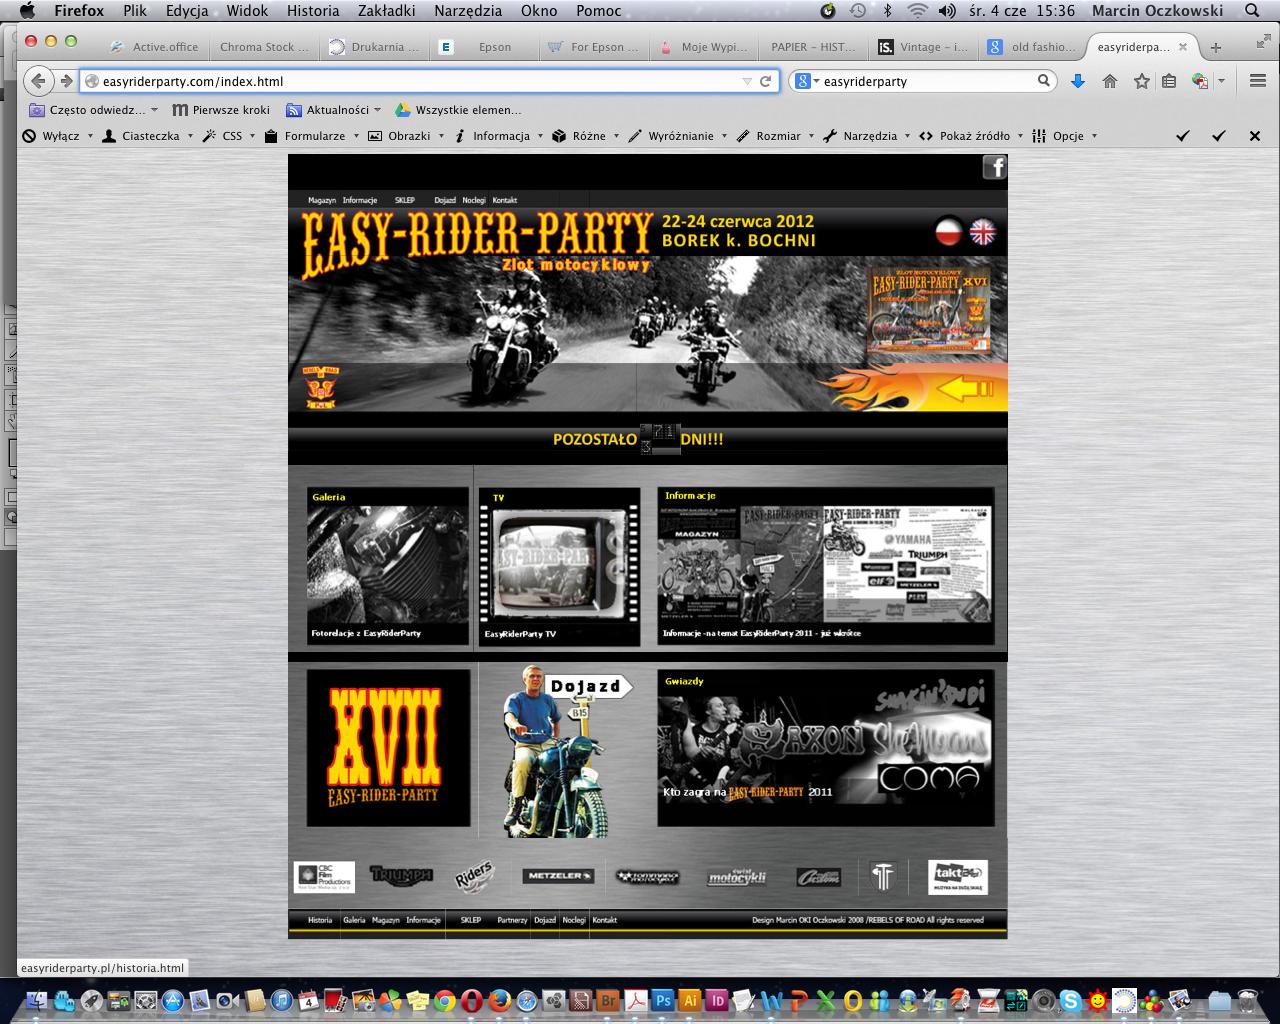 Zrzut ekranu 2014-06-4 o 15.36.00